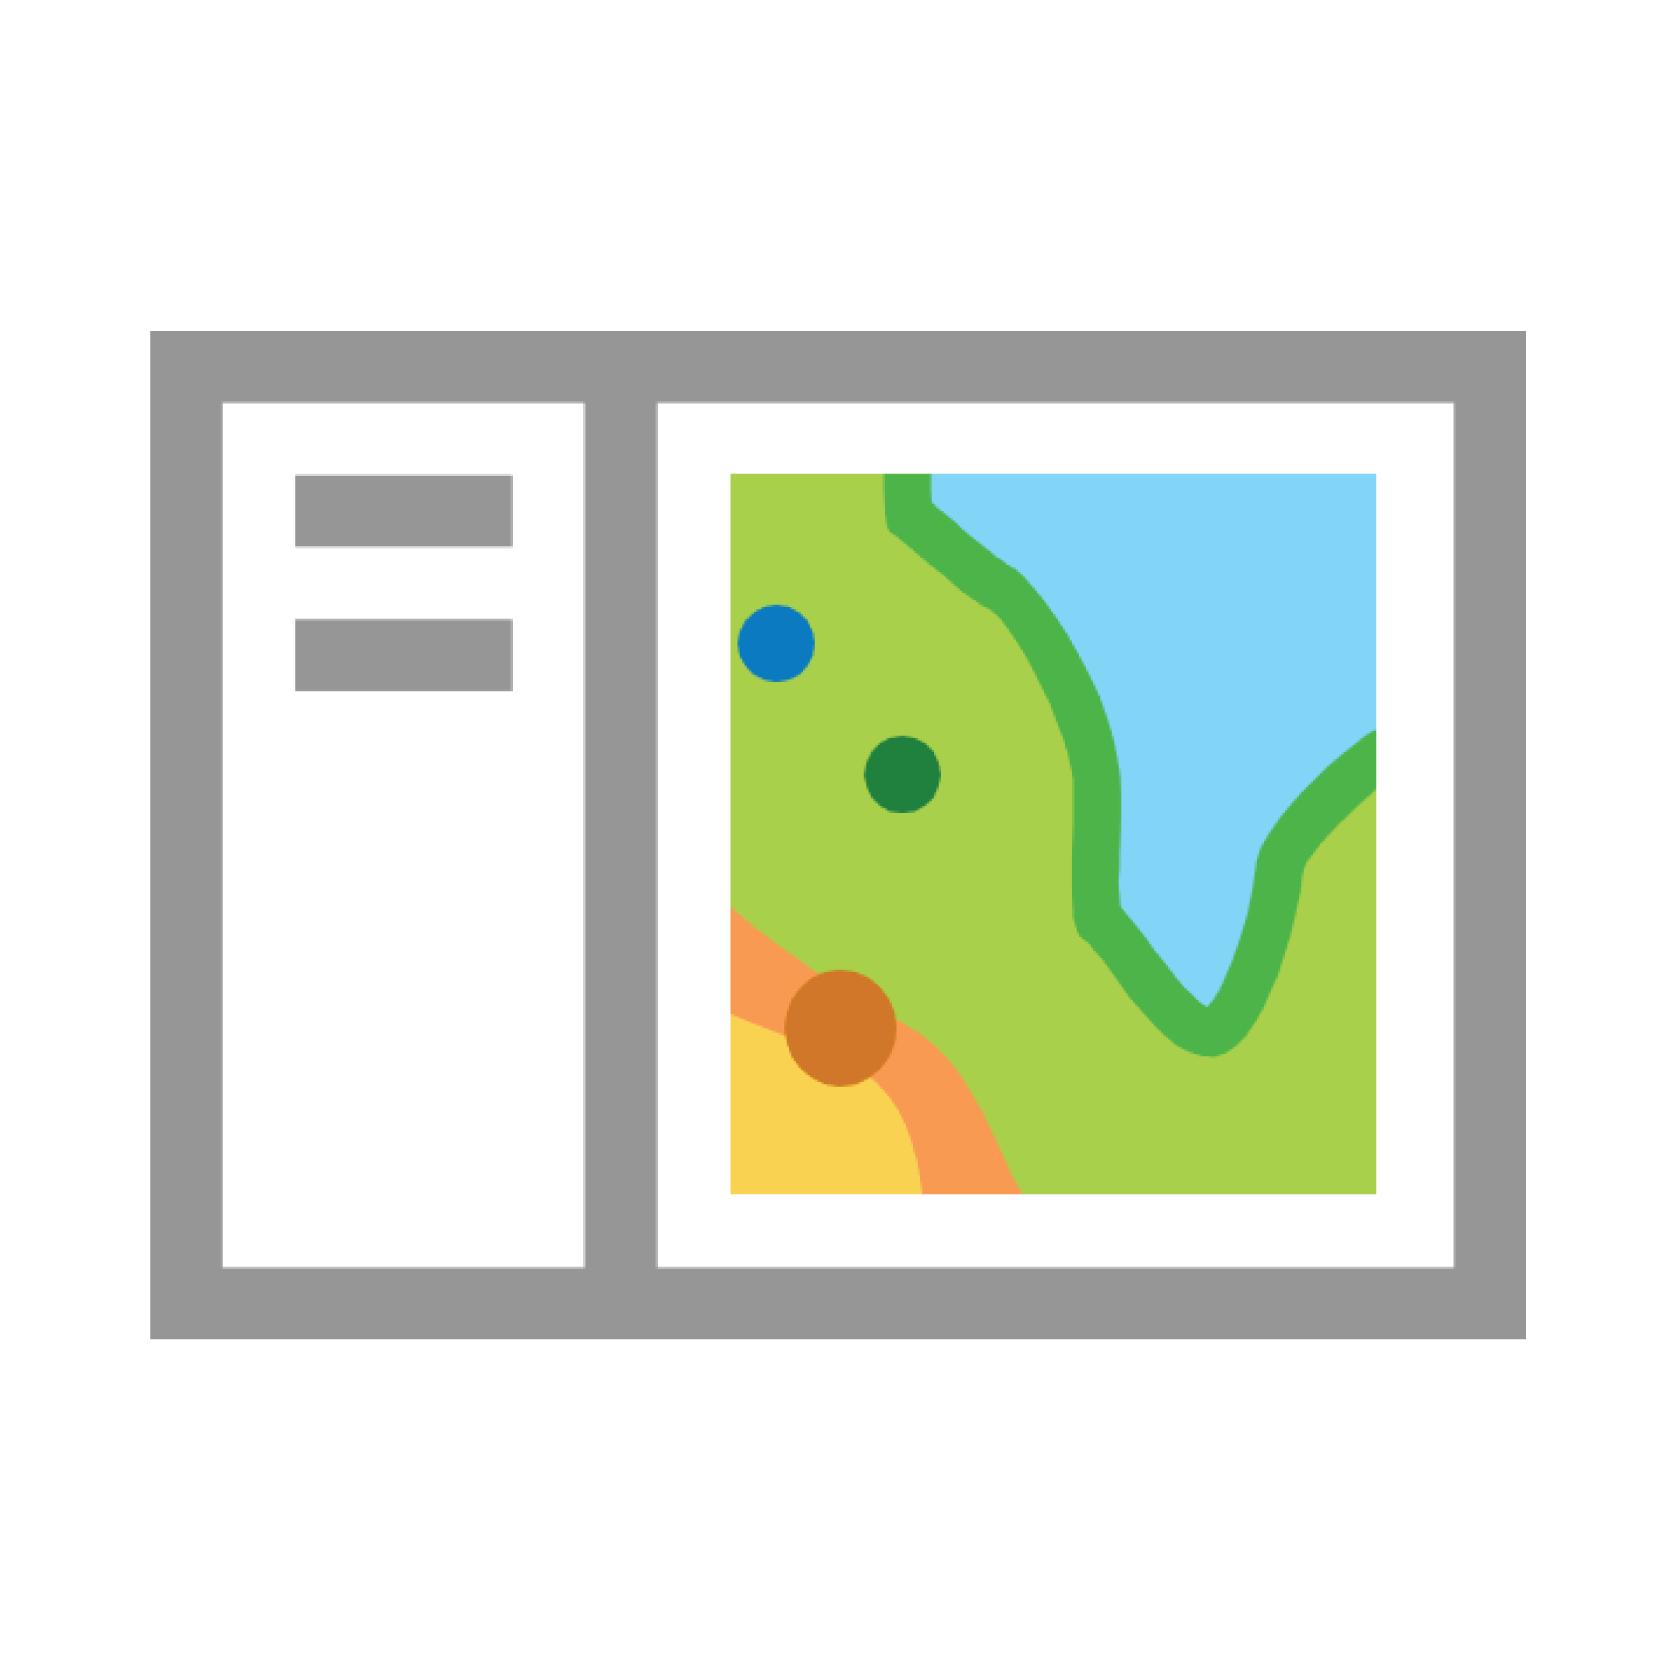 Organized by Geolocation